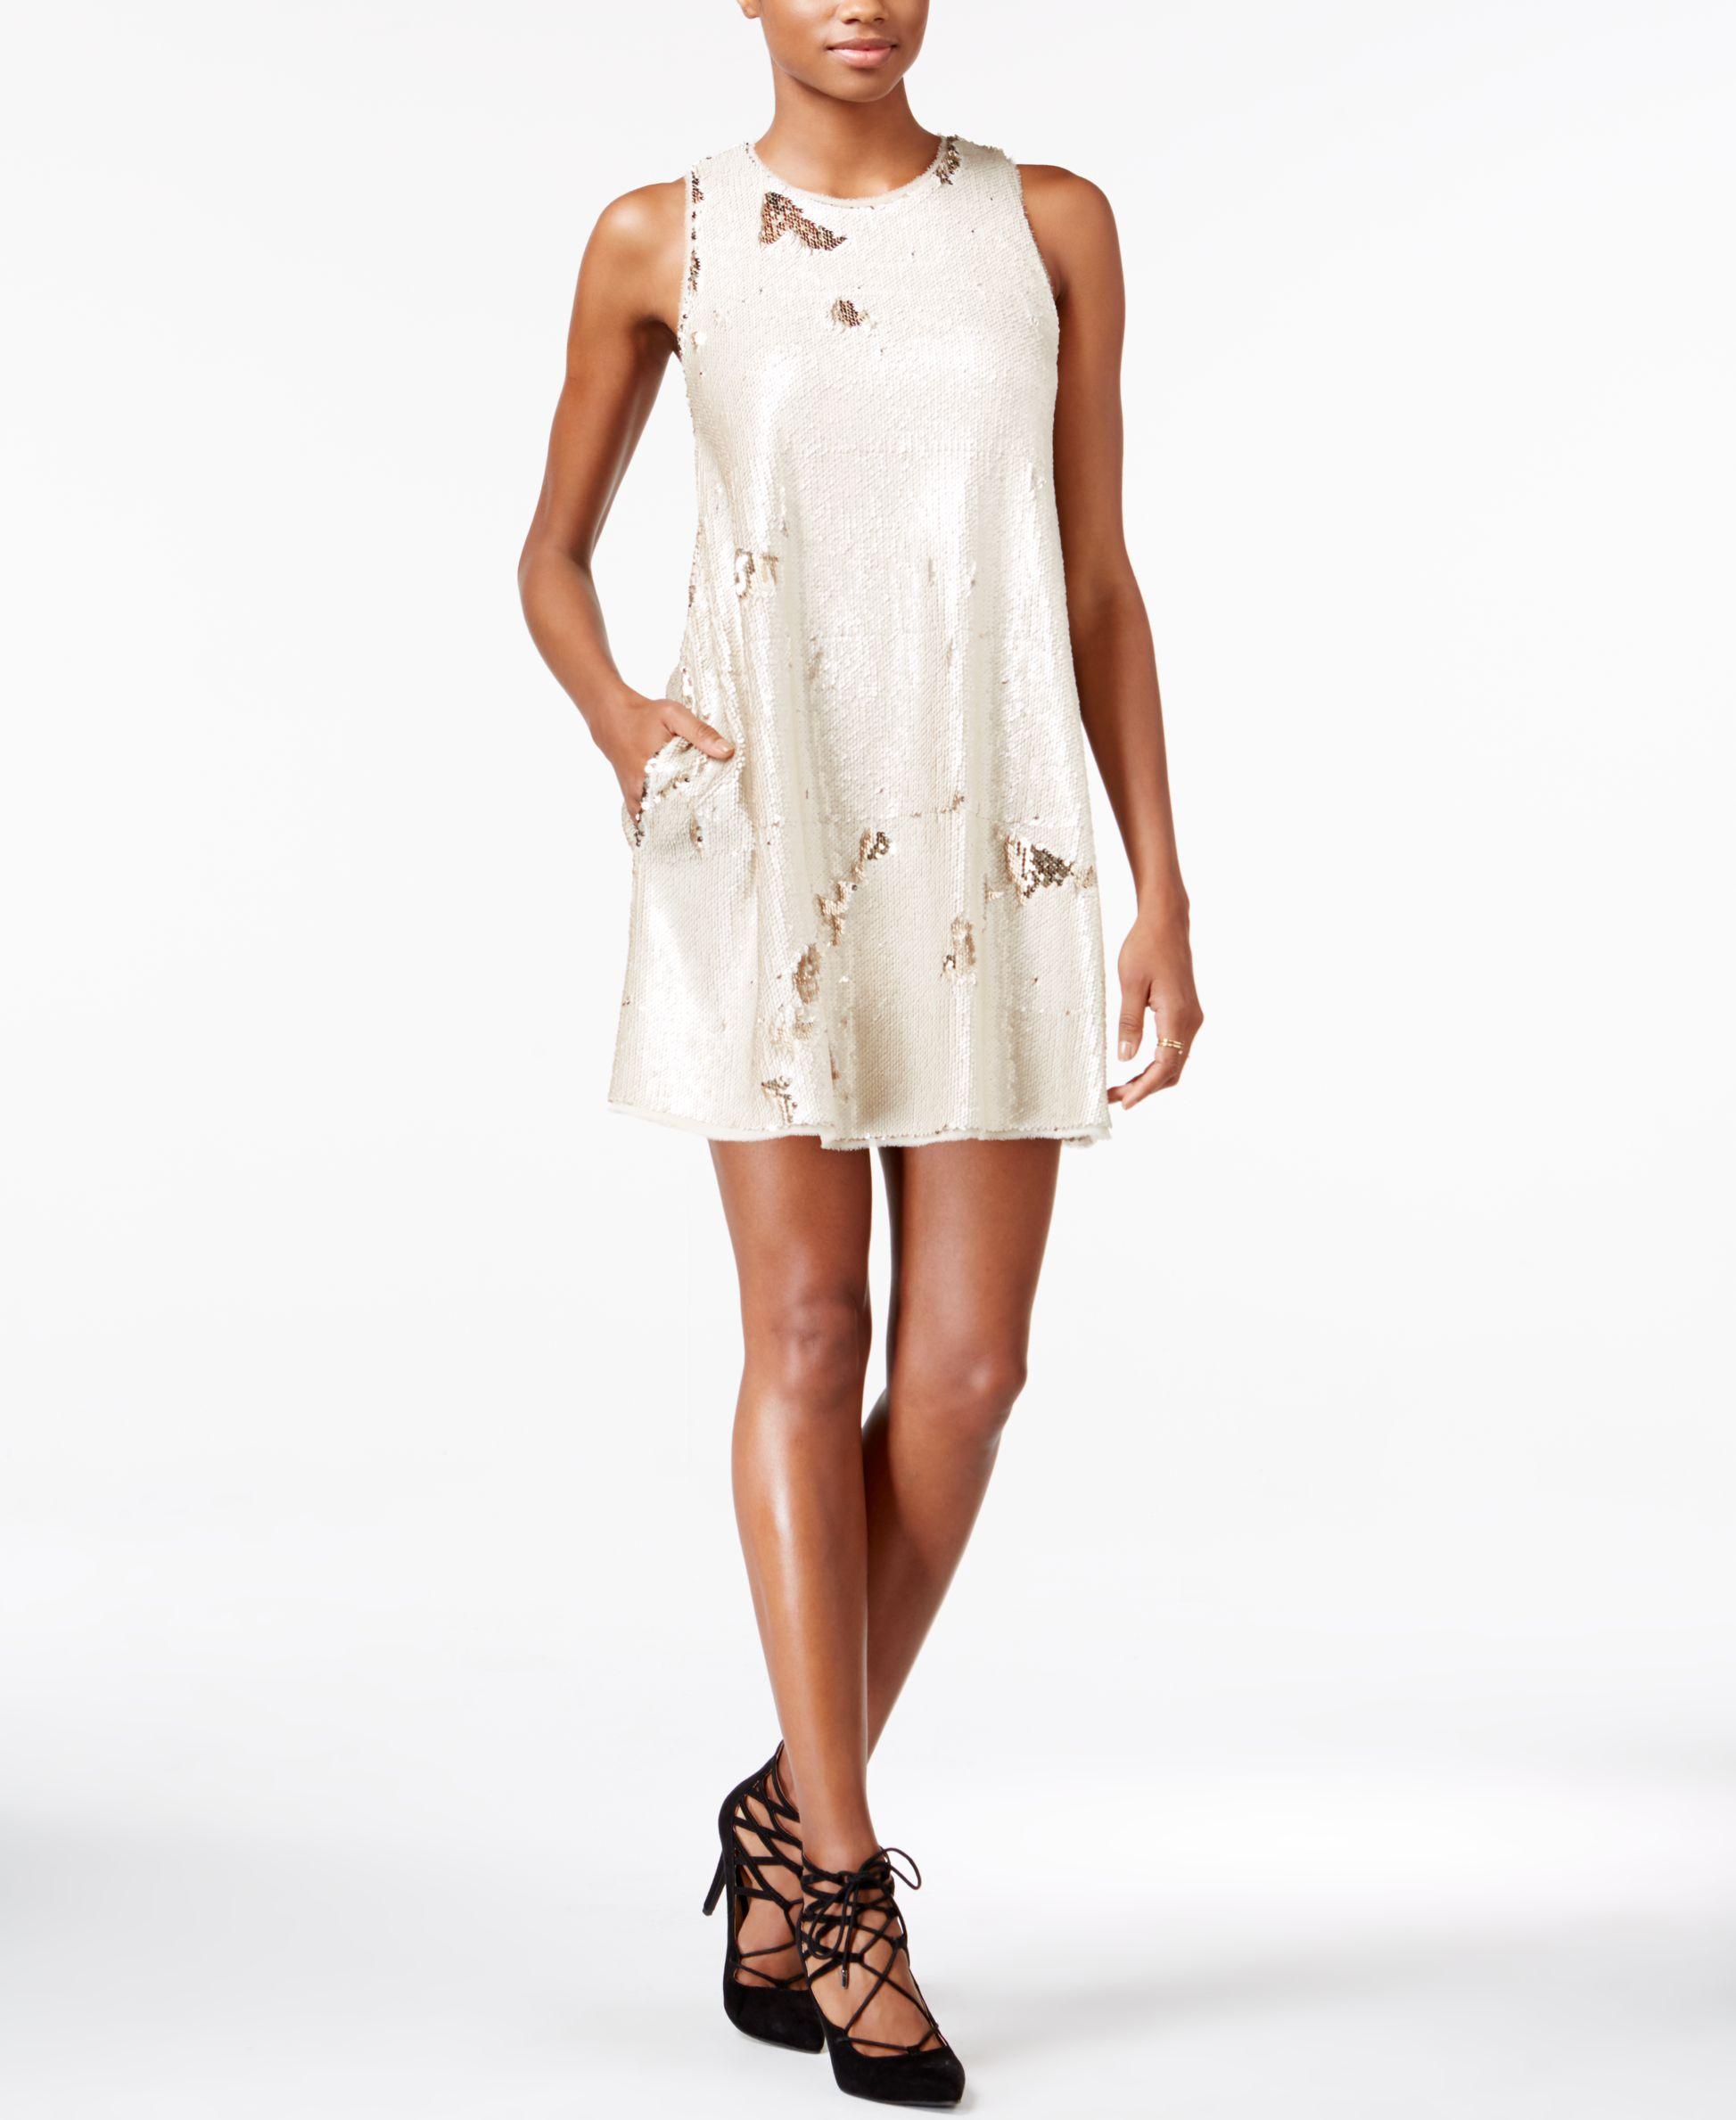 rachel rachel roy sequined shift dress products pinterest